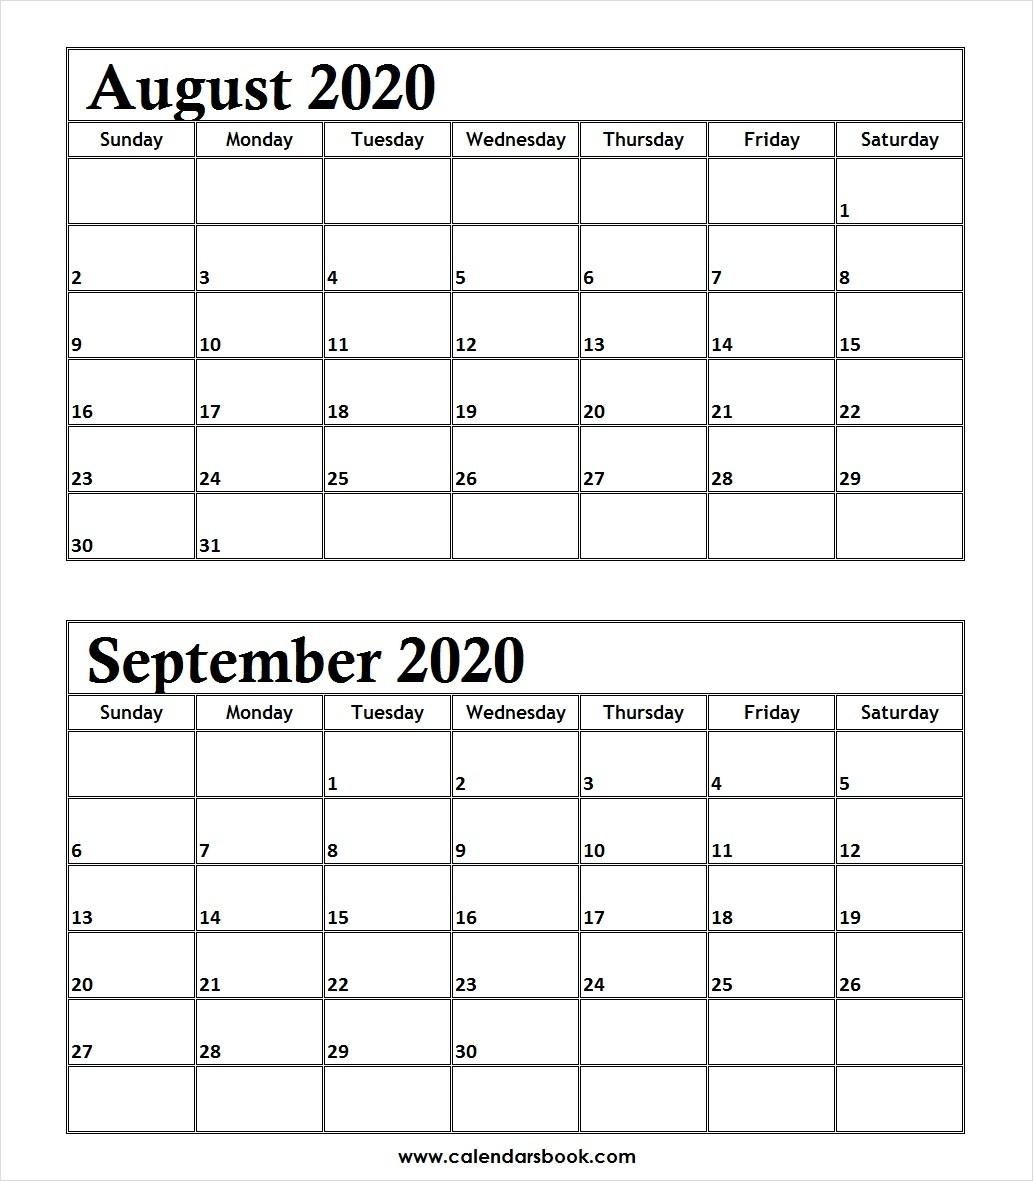 Behavior Weekly Calendar Template Free | Example Calendar throughout August 2020 And September 2020 Calendar